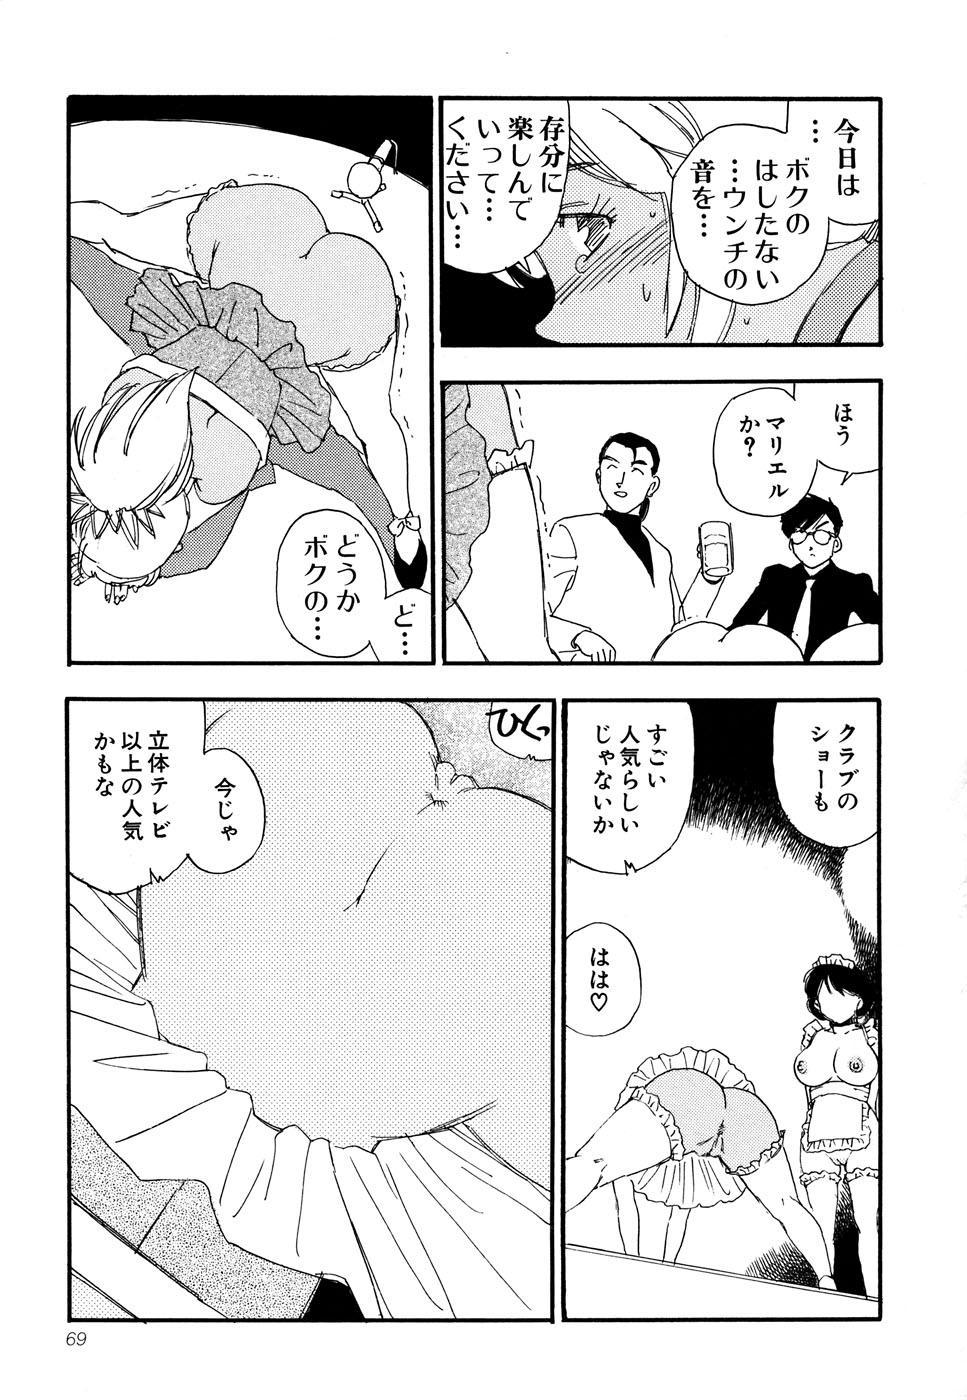 G-drive Vol.1 Ryoujokuhen 68